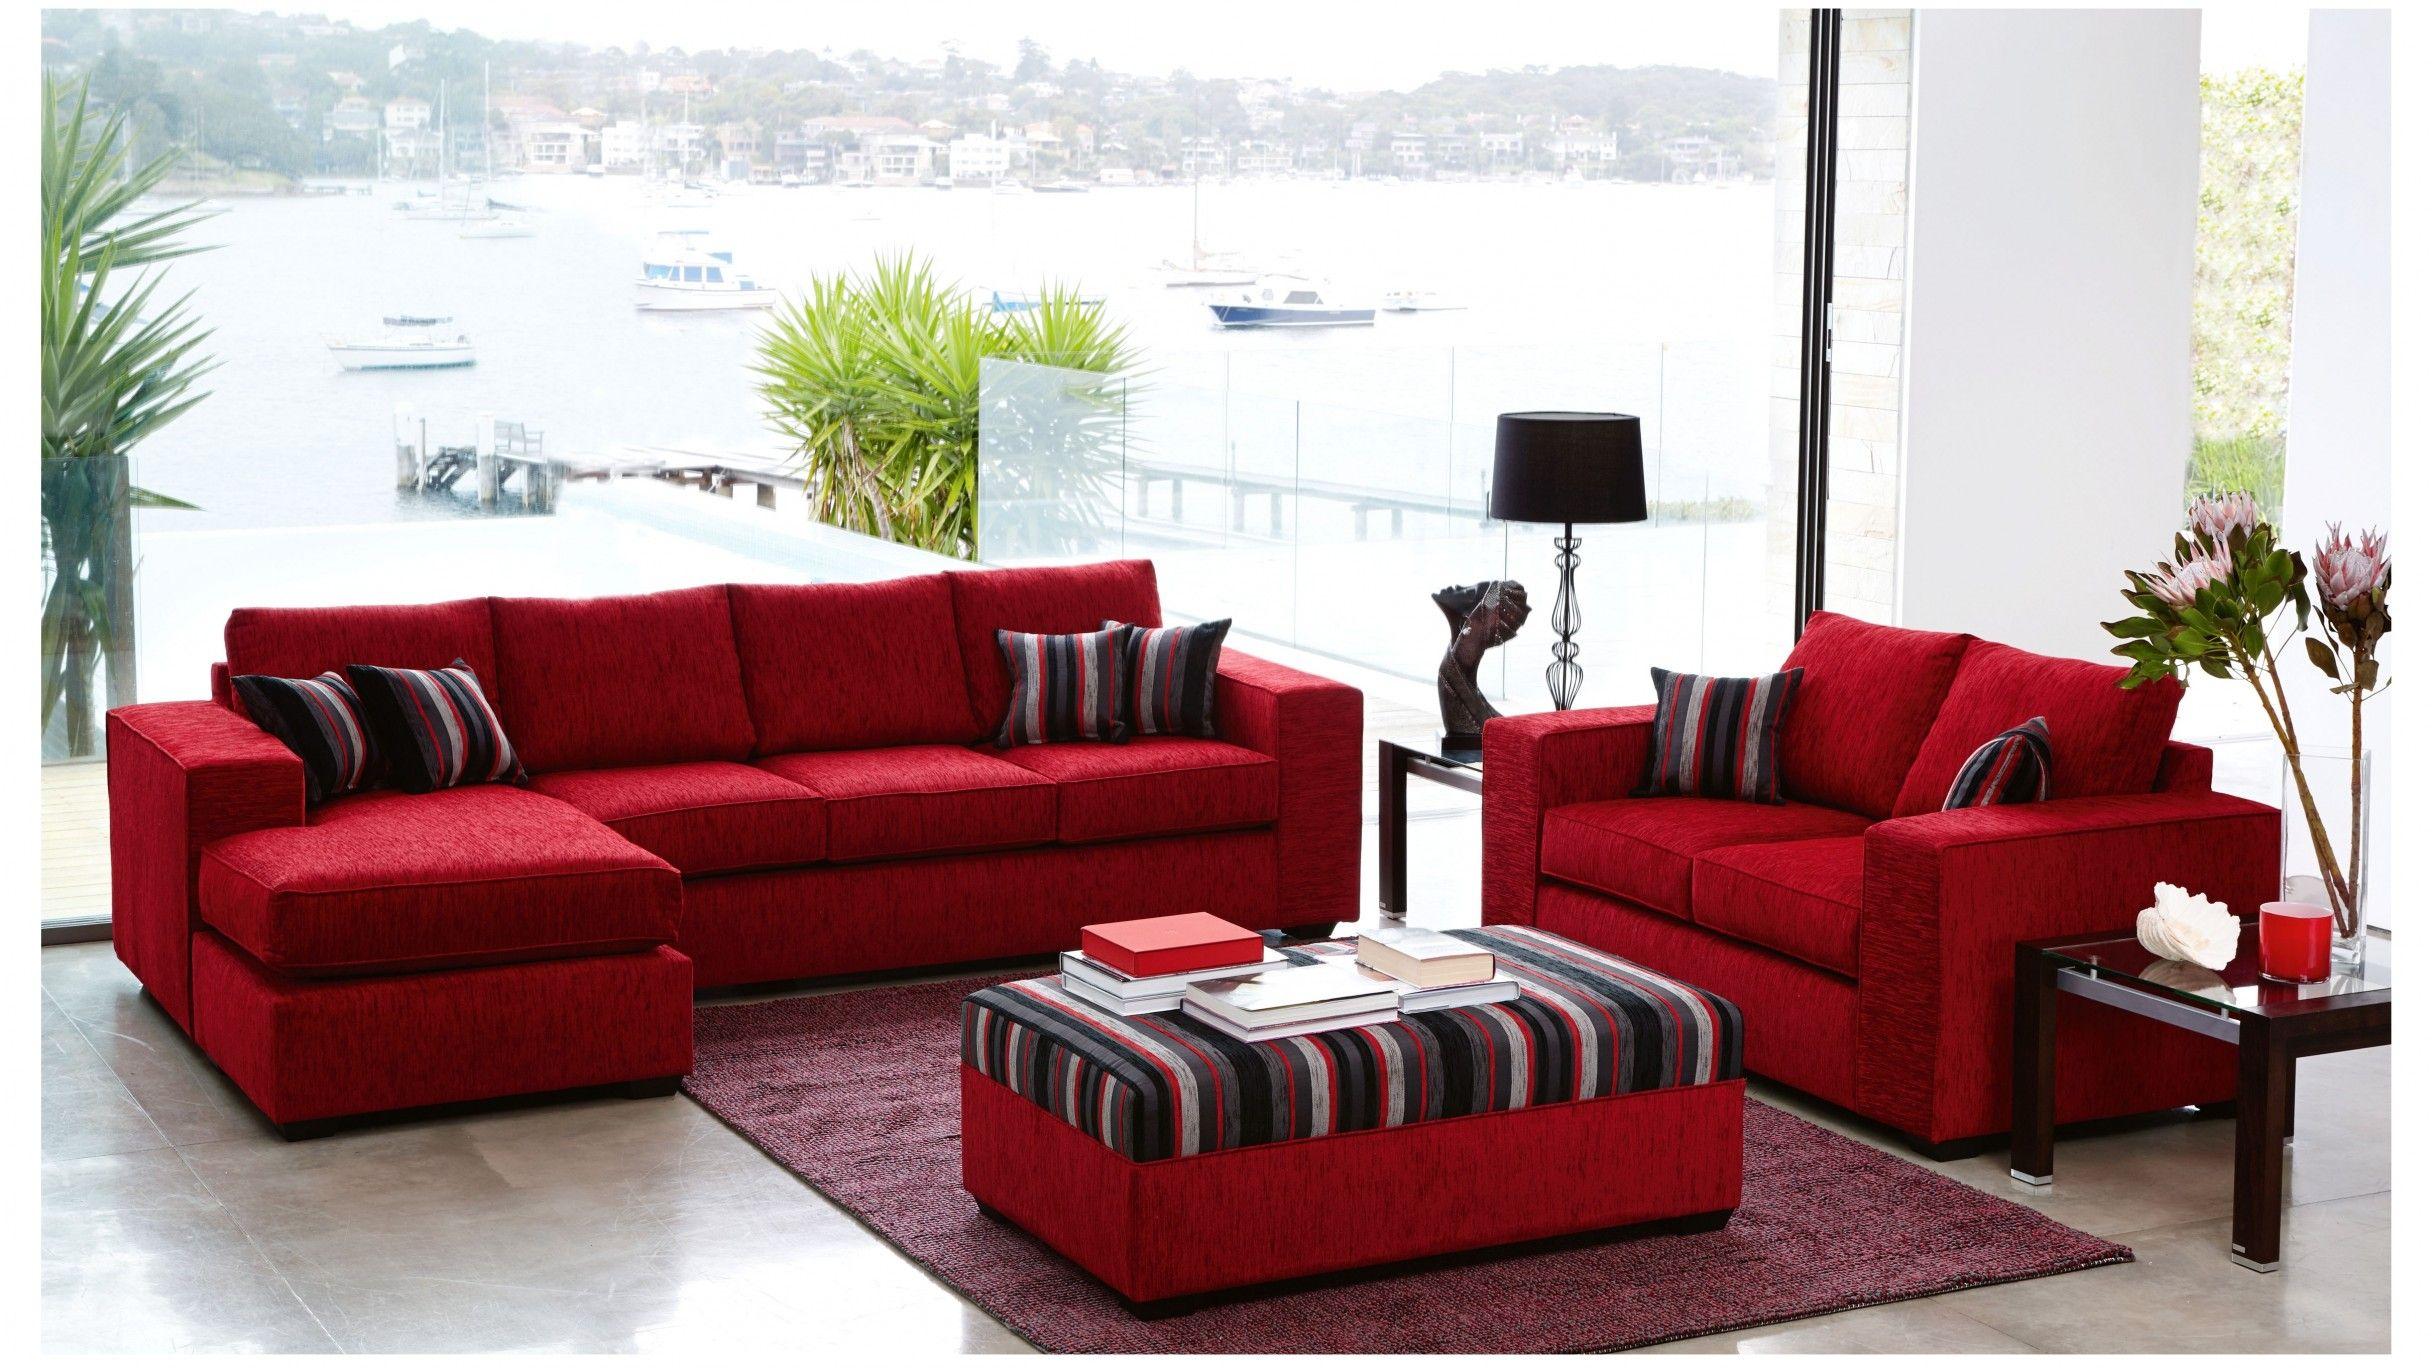 City 4 Seater Suite Hn Leather Corner Sofa Lounge Suites Sofa Suites